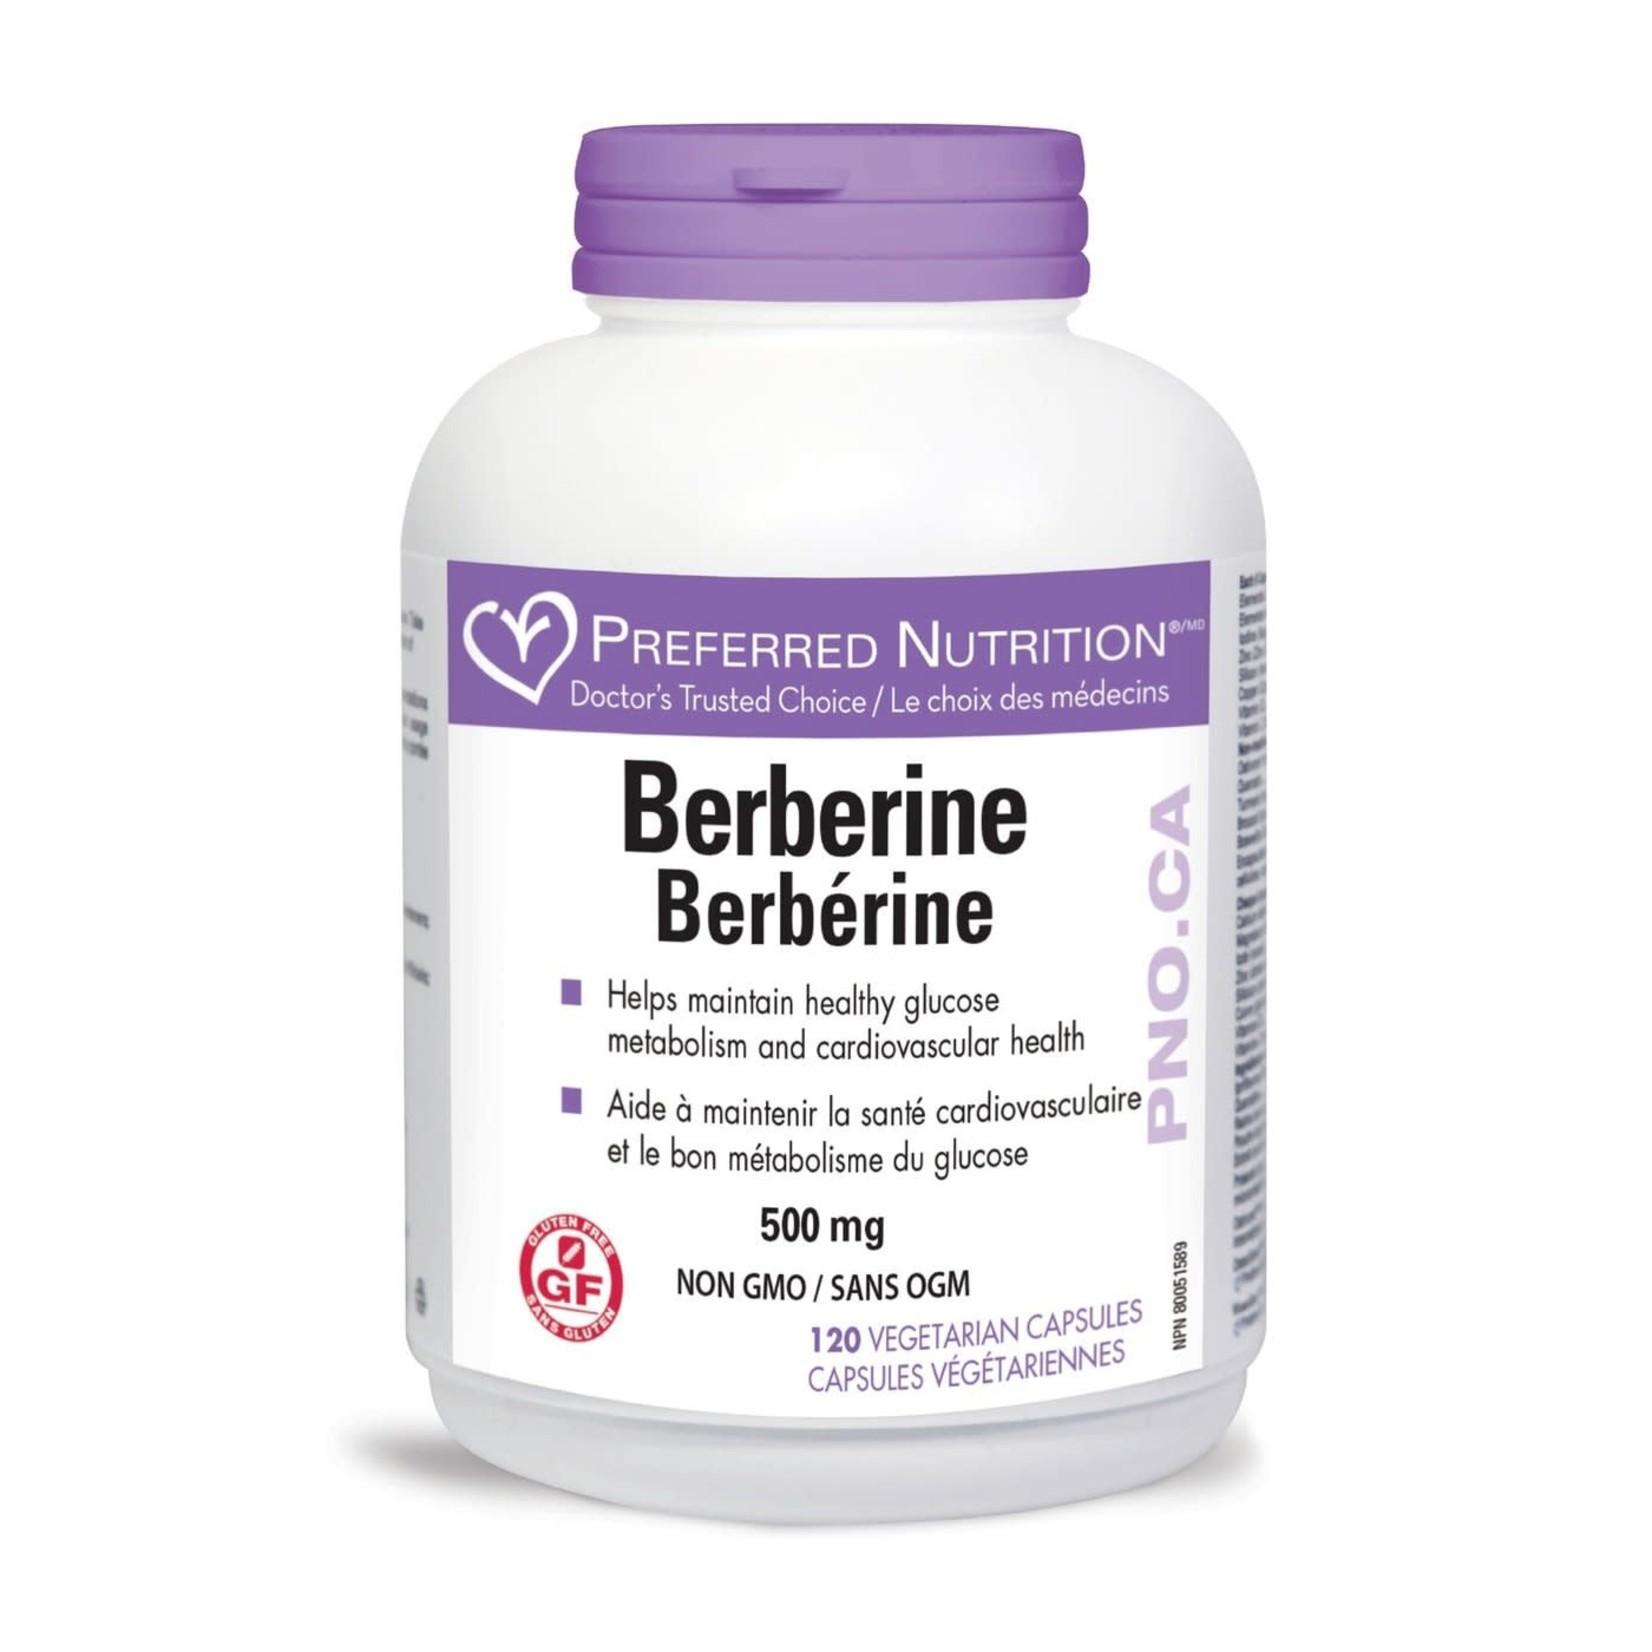 Preferred Nutrition Preferred Nutrition Berberine 120 caps